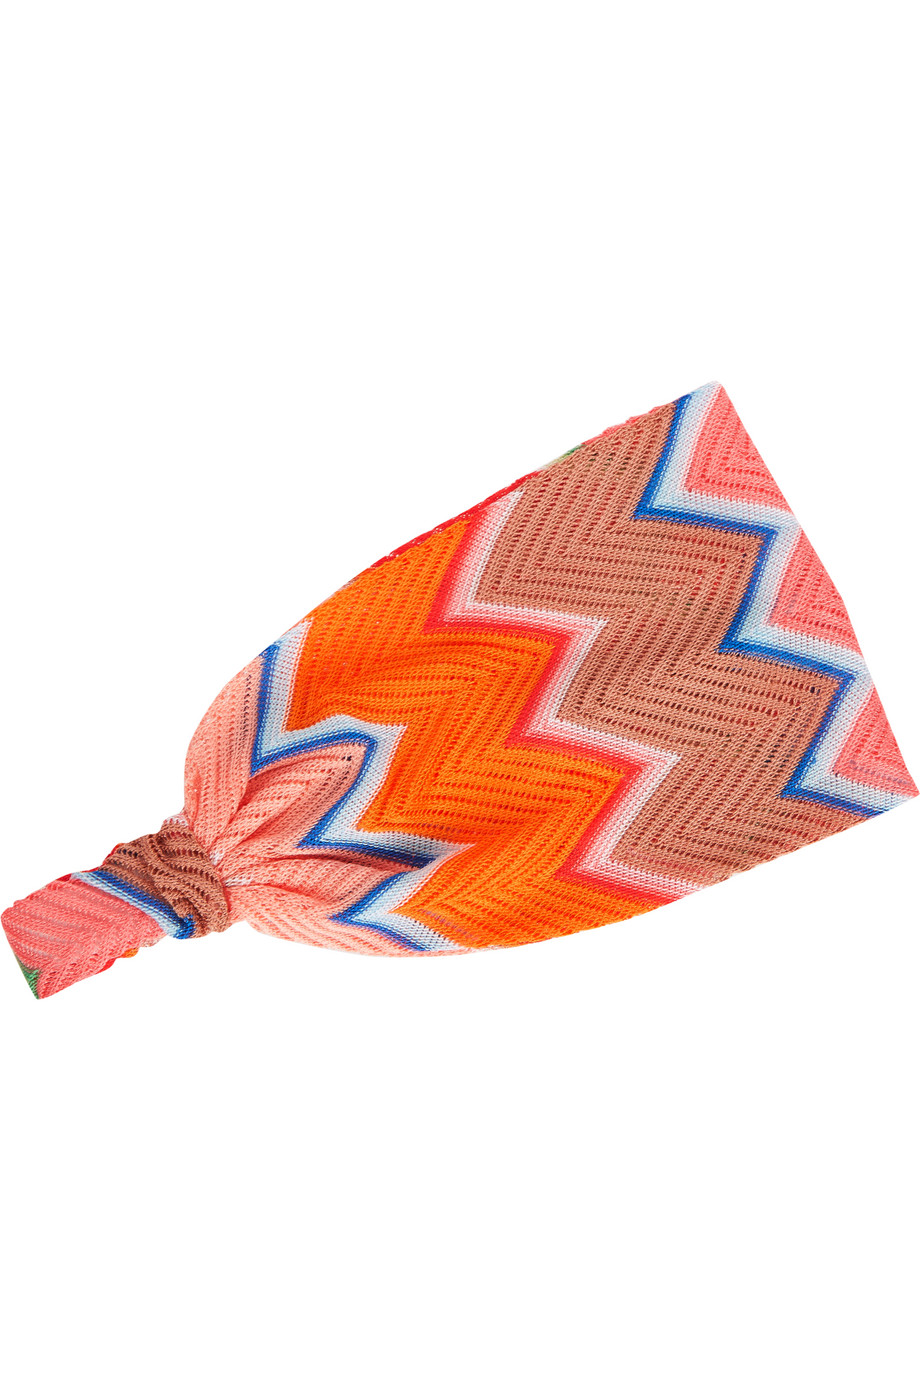 Missoni Crochet-Knit Headband, Pink/Orange, Women's